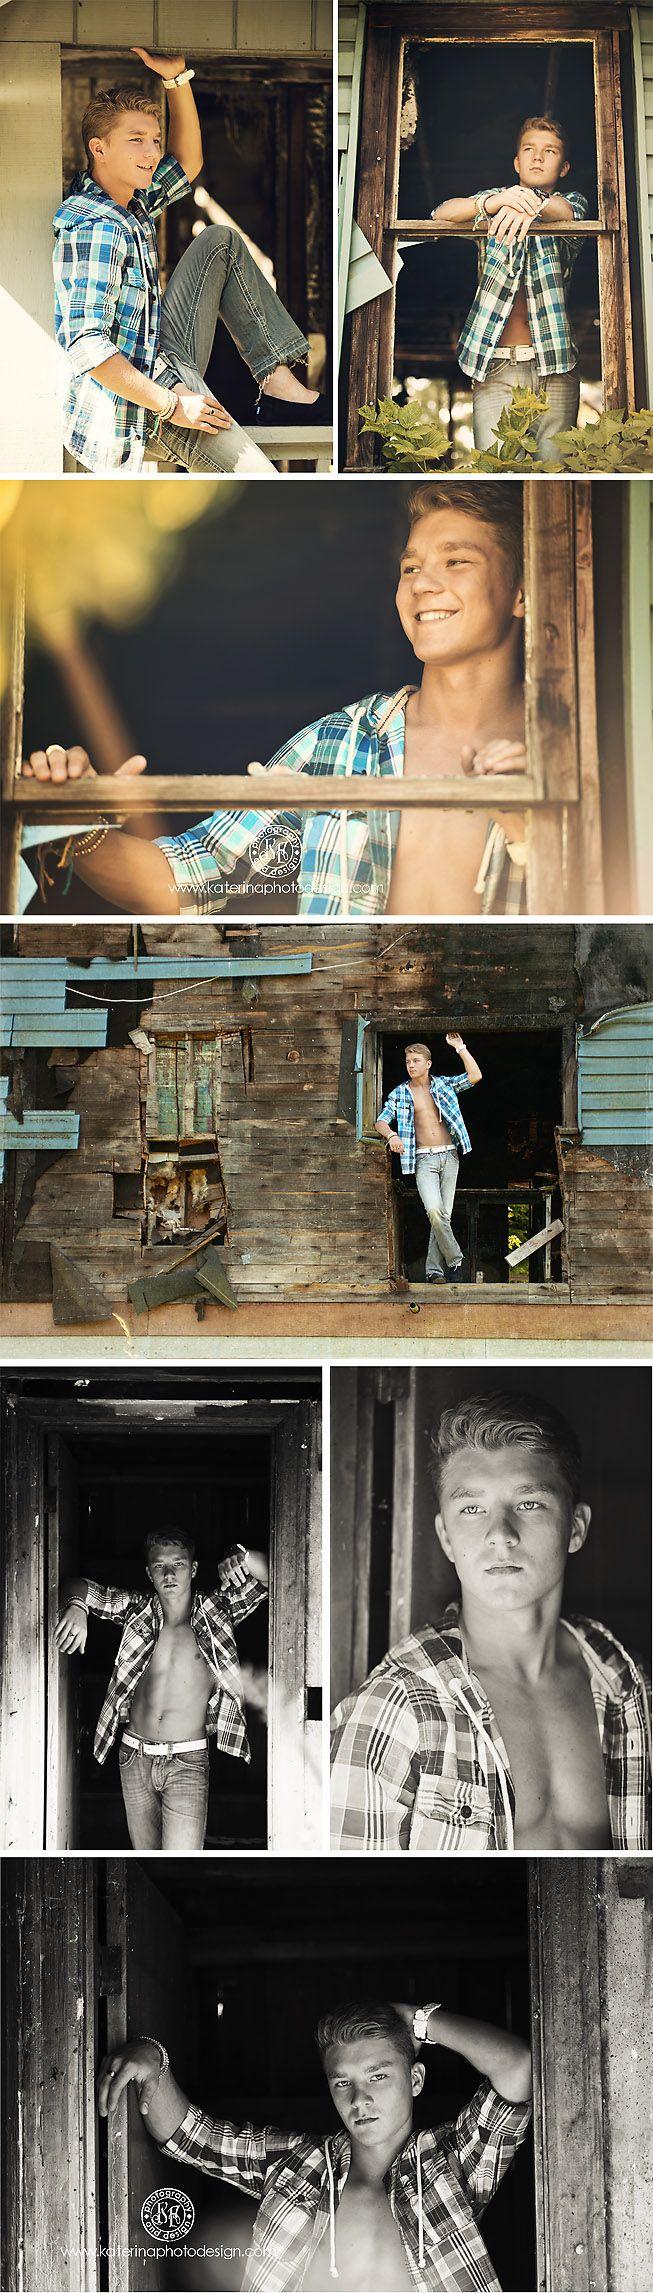 #senior #photography #boys / #rural || #rustic #photosession